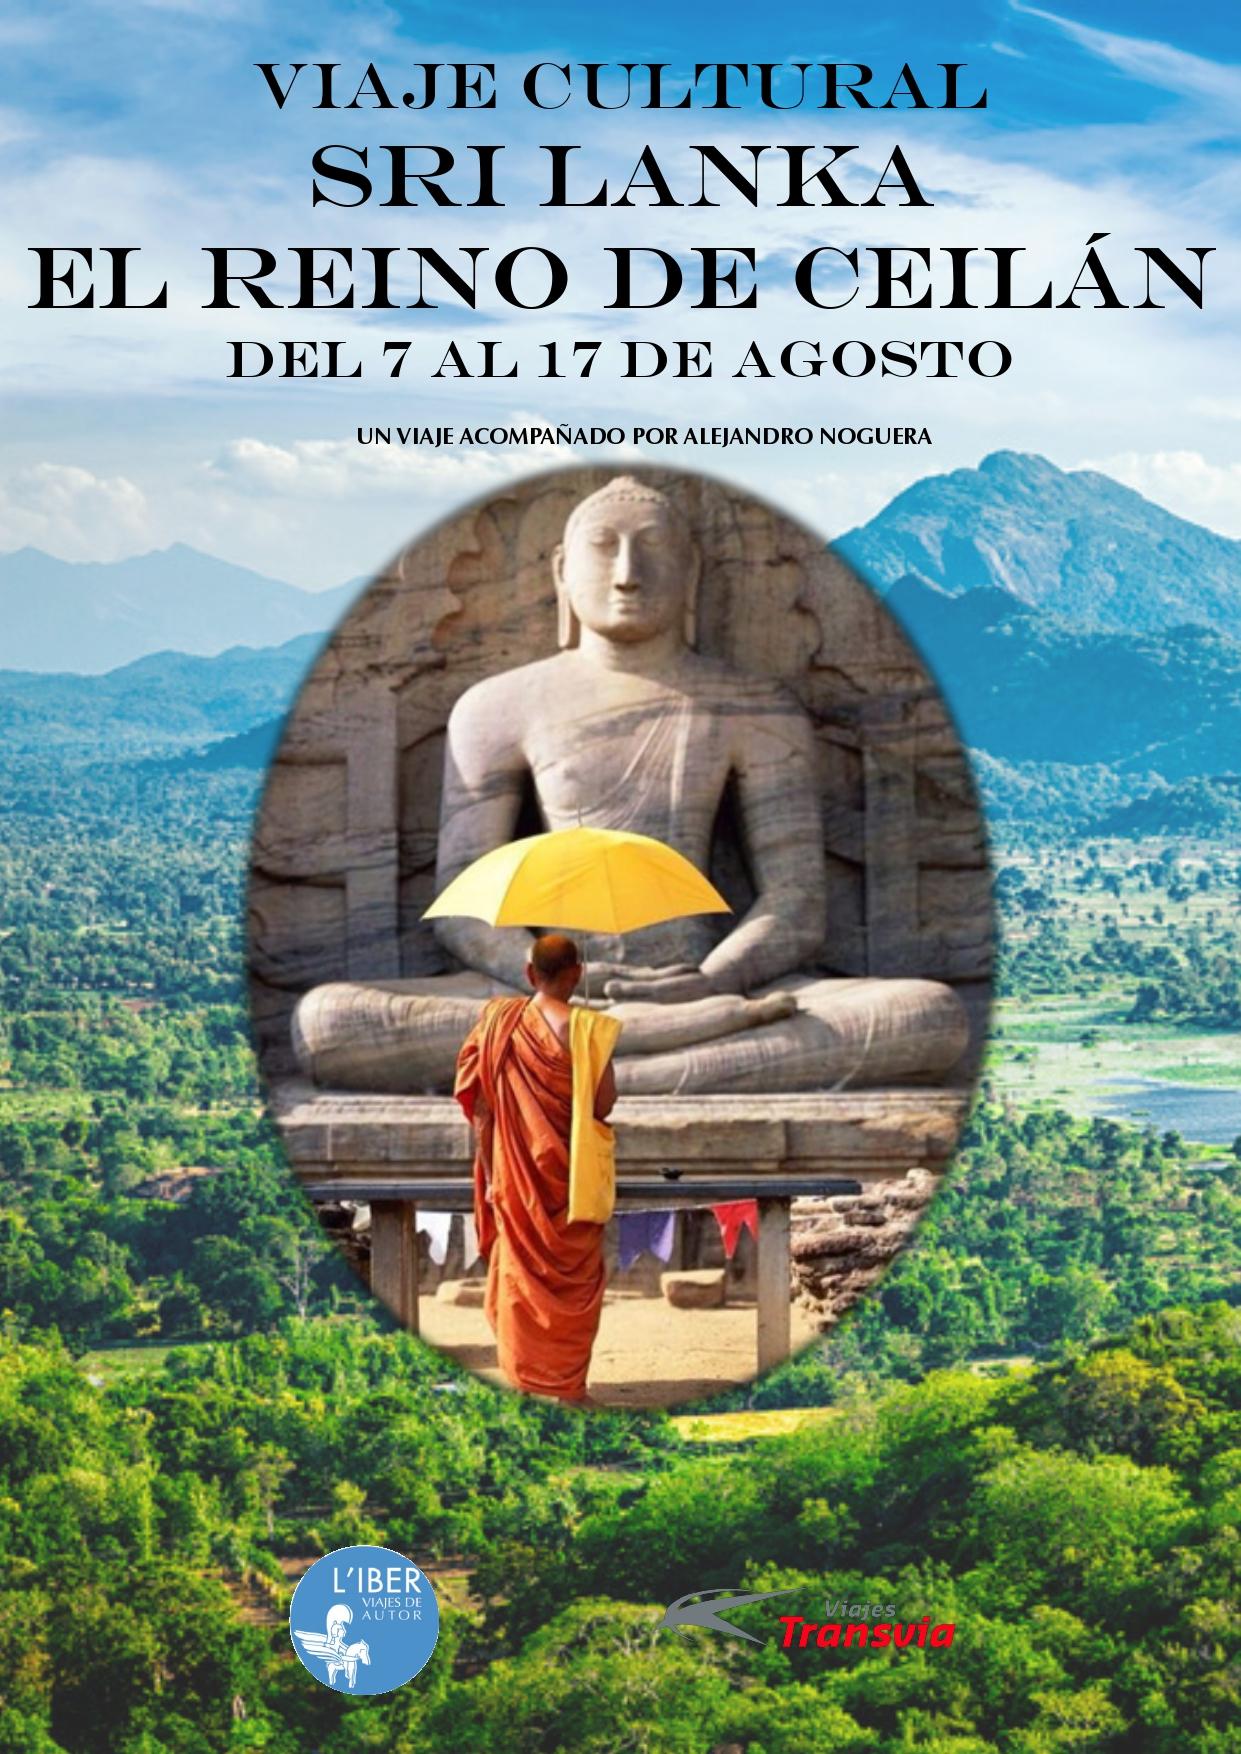 Viaje cultural a Sri Lanka